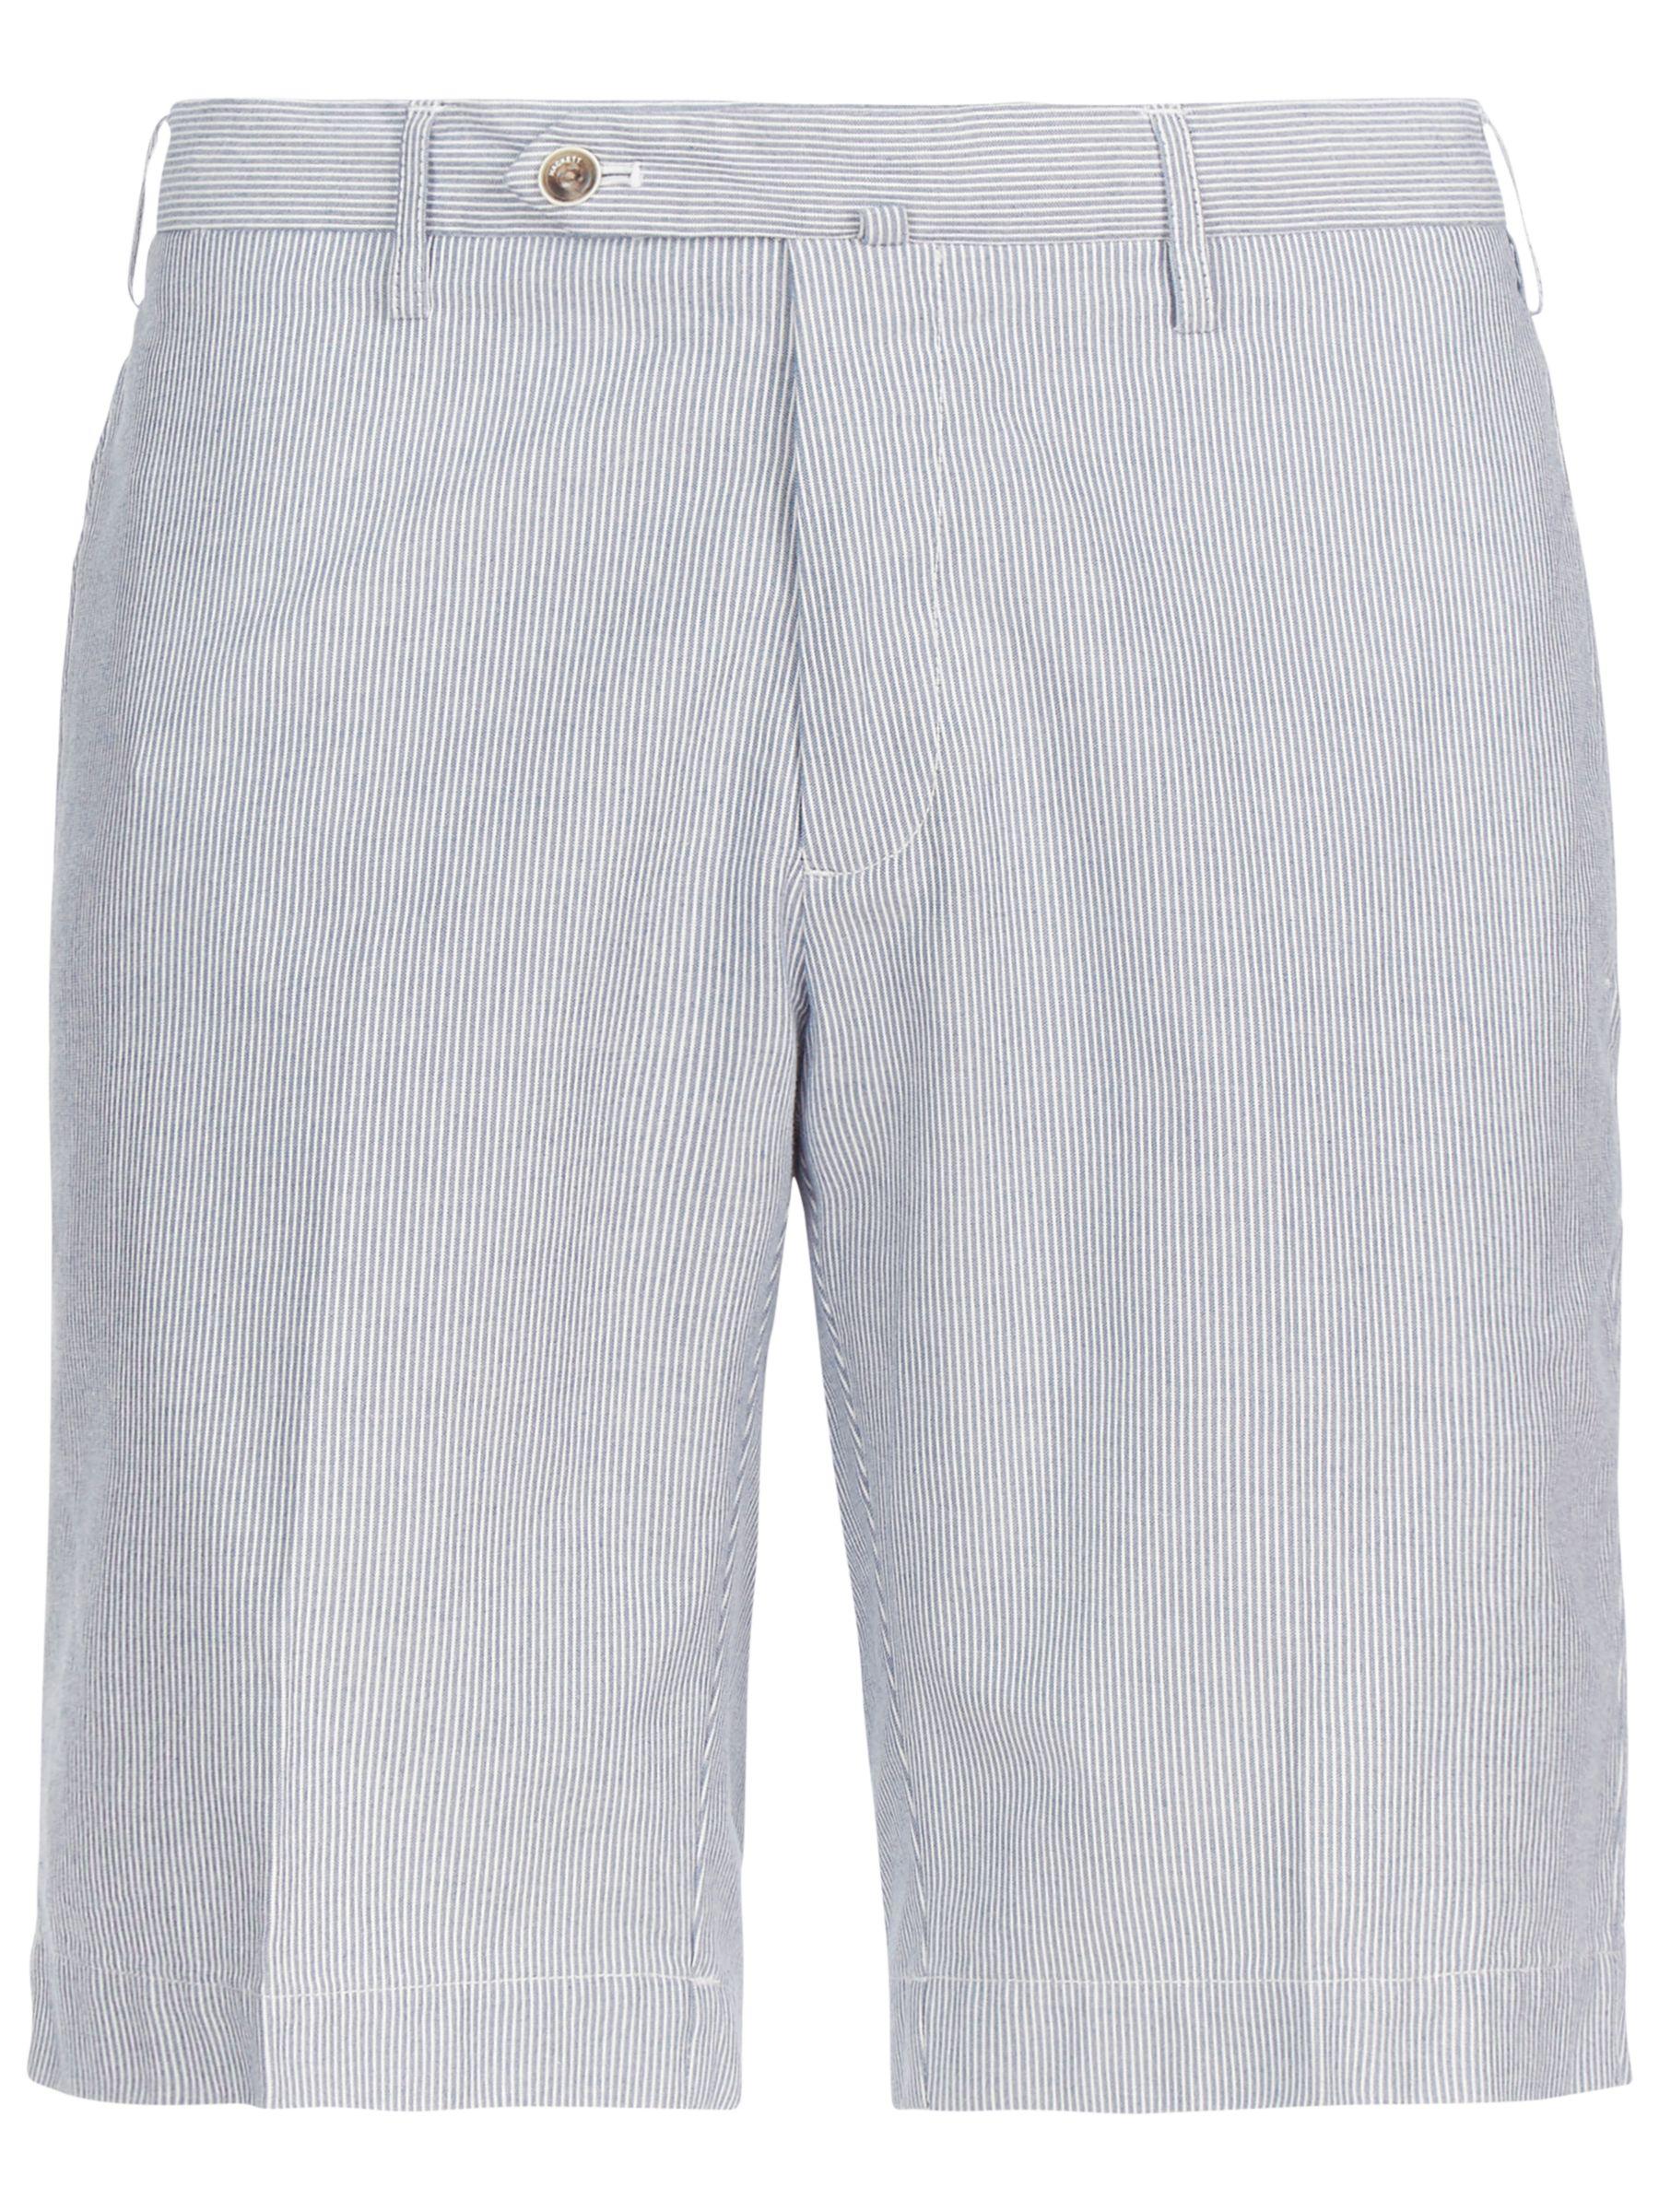 Hackett London Hackett London Nautical Stripe Cotton Shorts, Navy/White